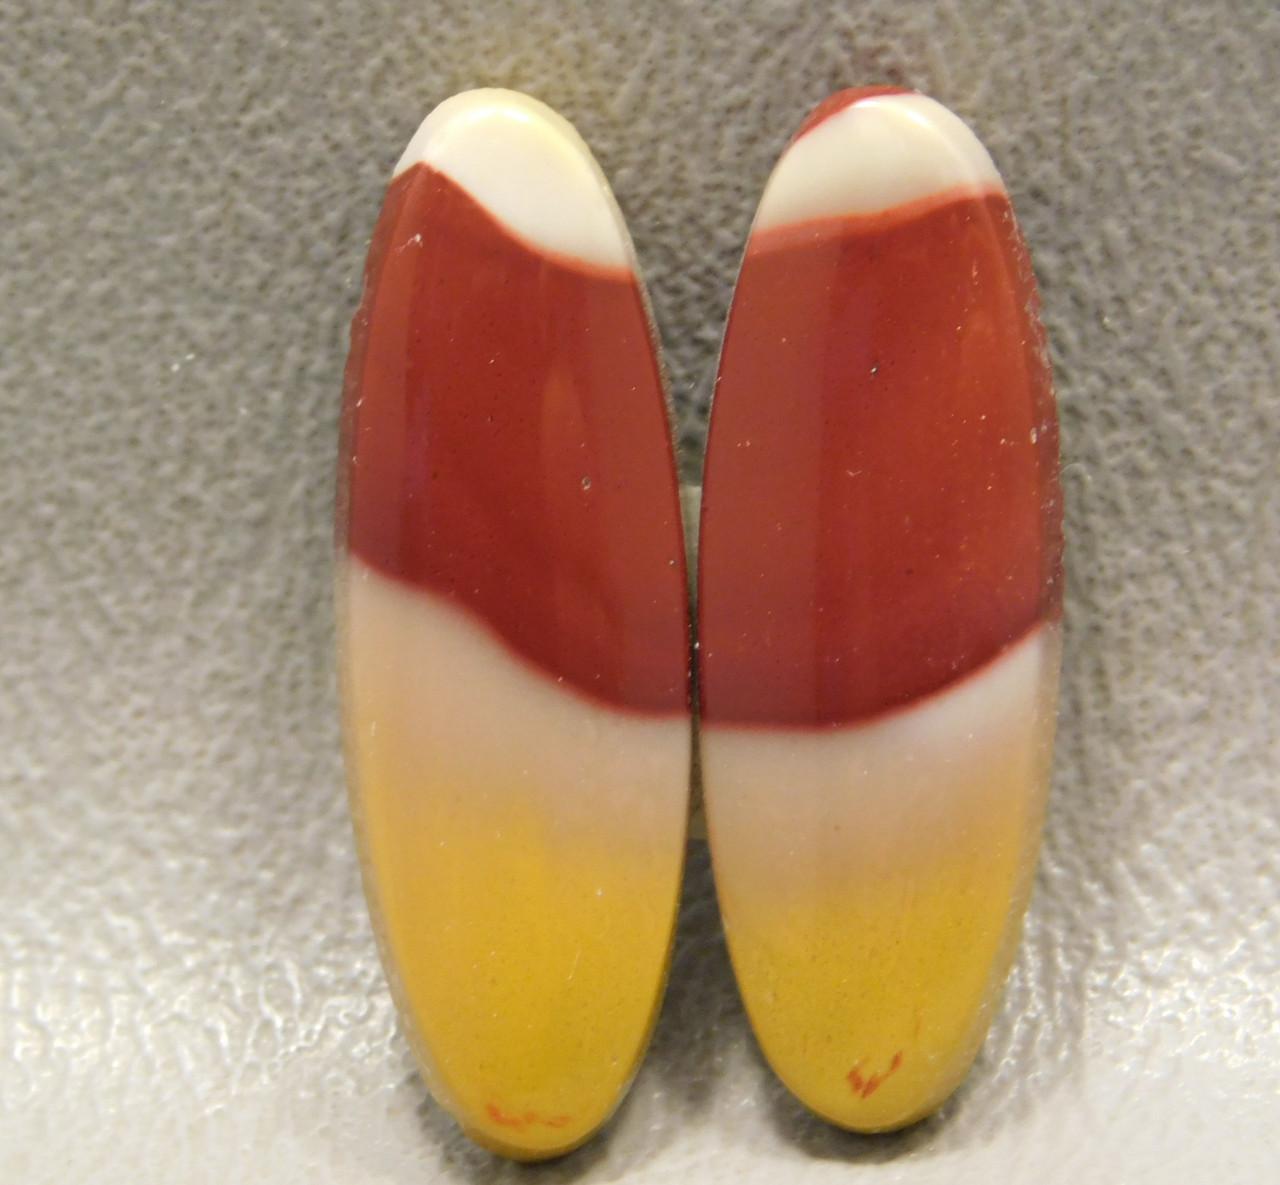 Mookaite Jasper Cabochons Pairs Red Yellow Ovals Stones #2